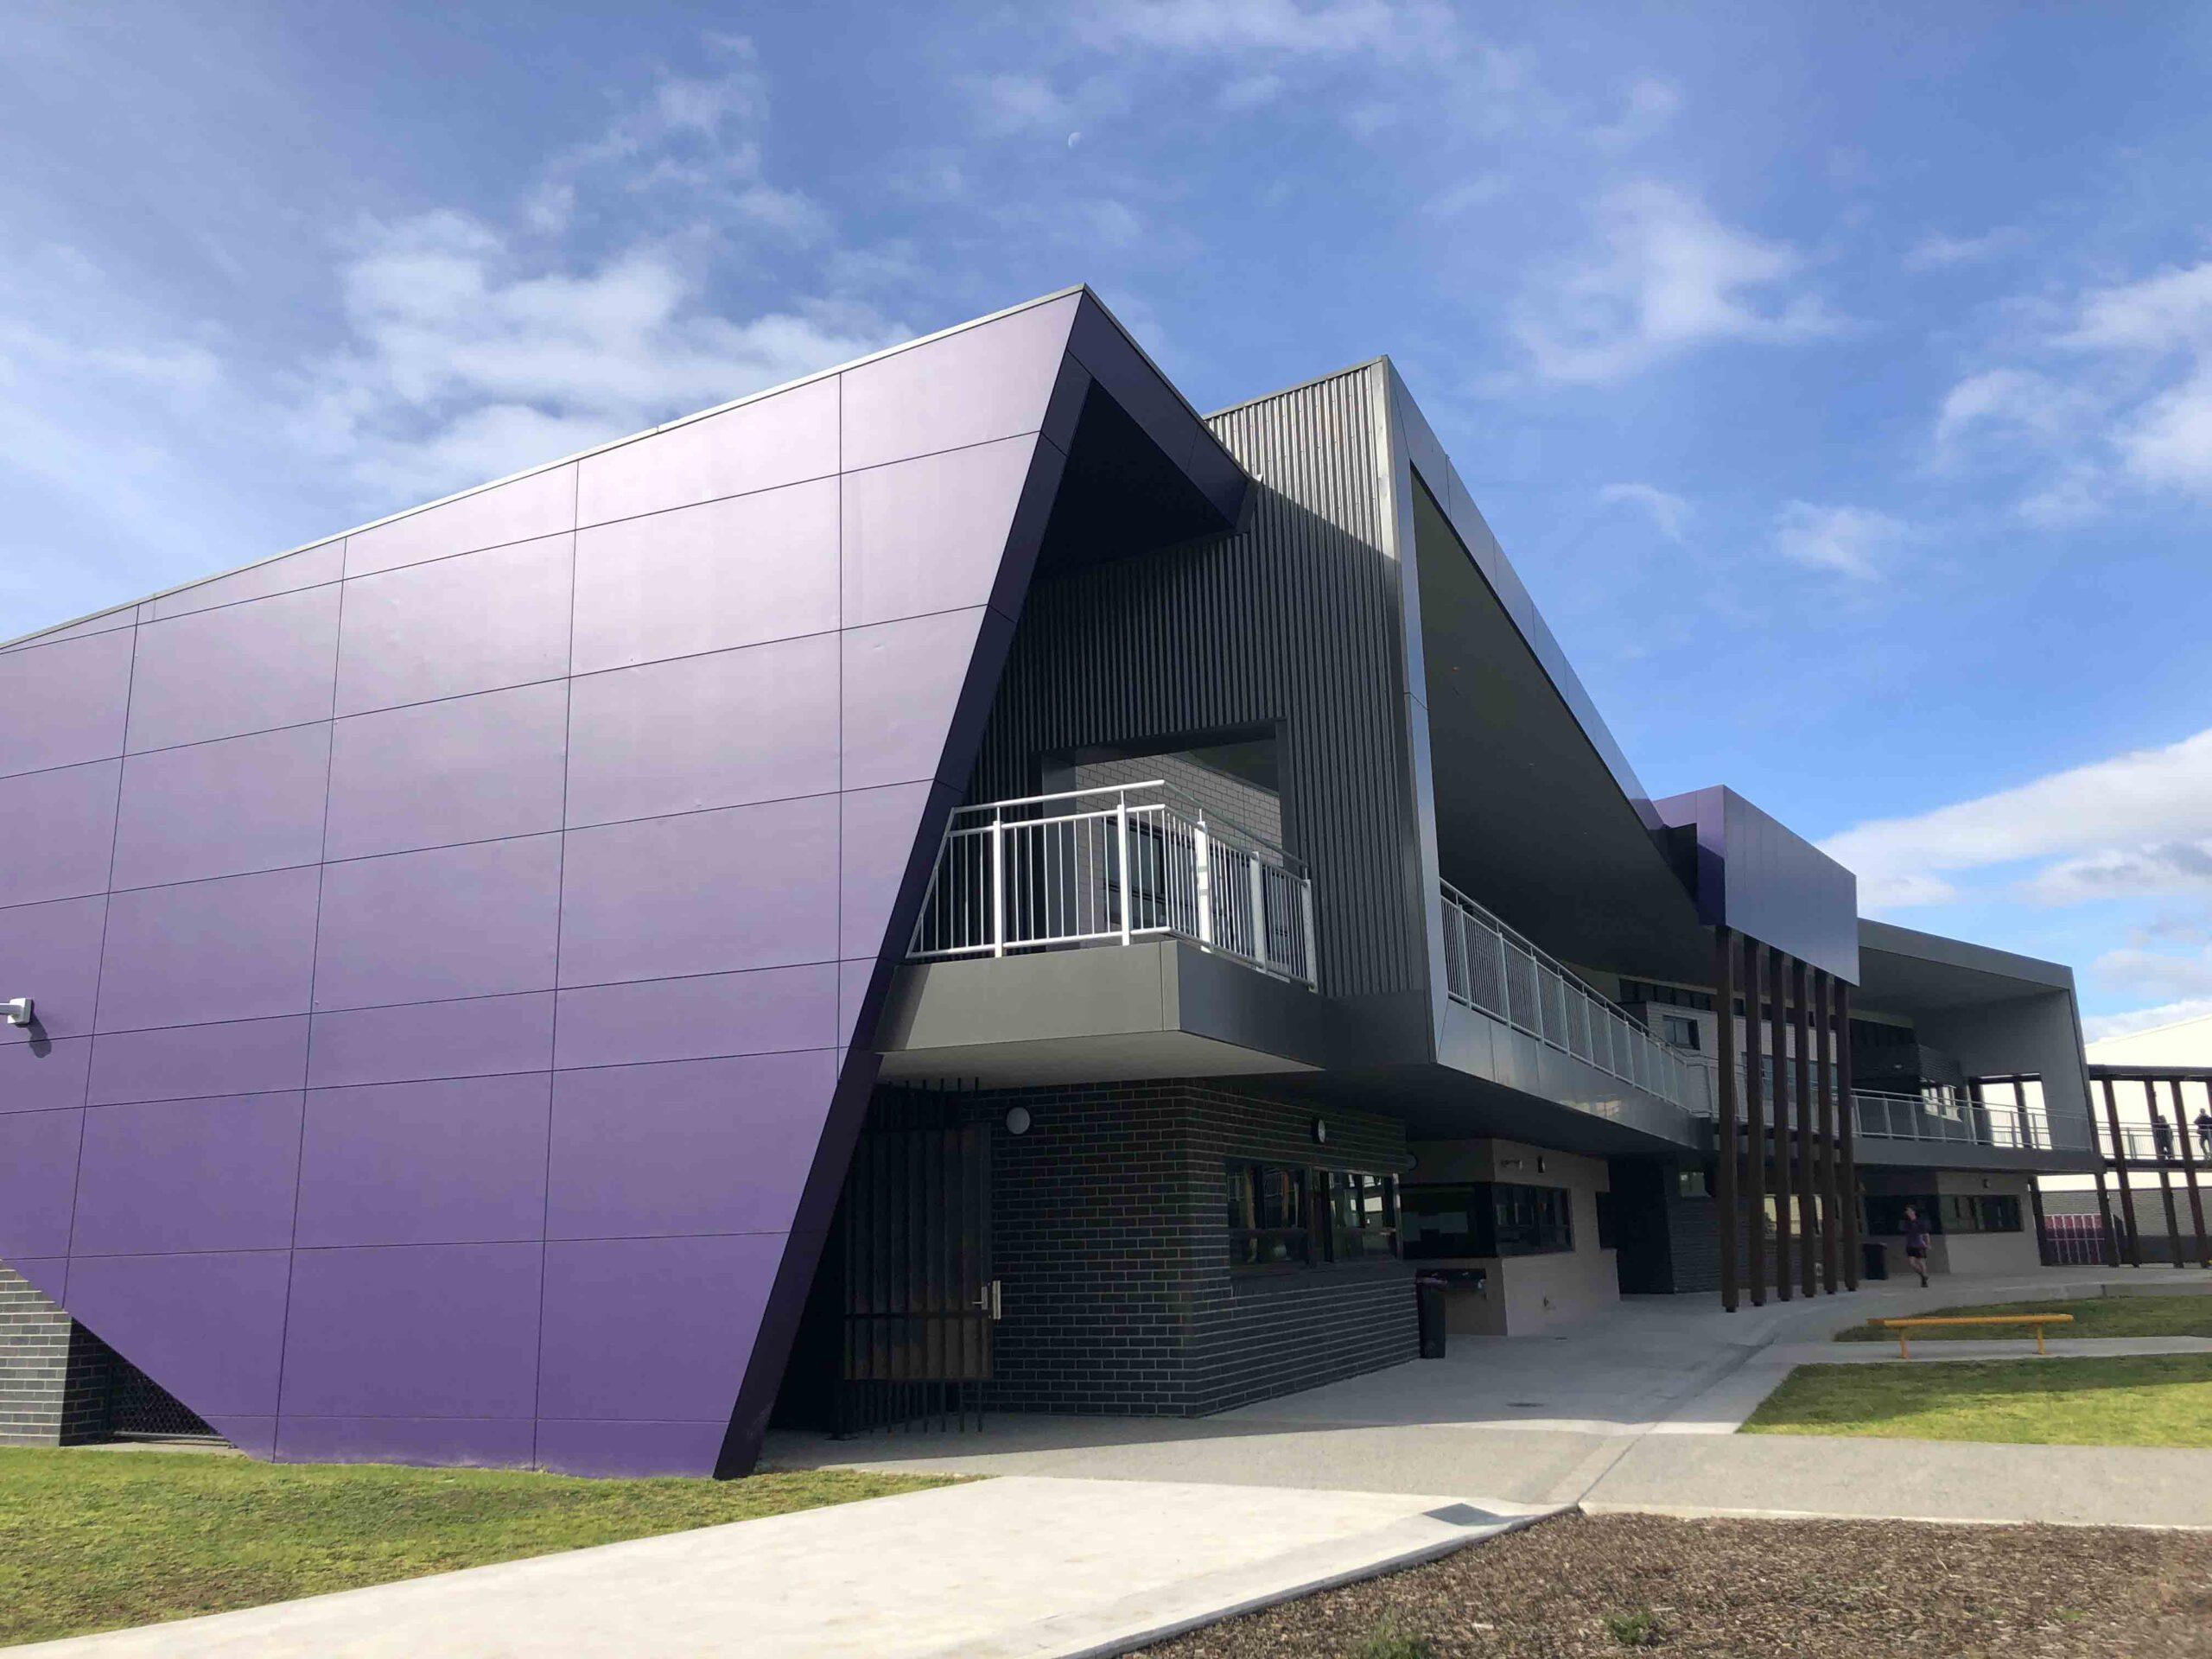 A picture of the Senior School Building showcasing it's purple facade.